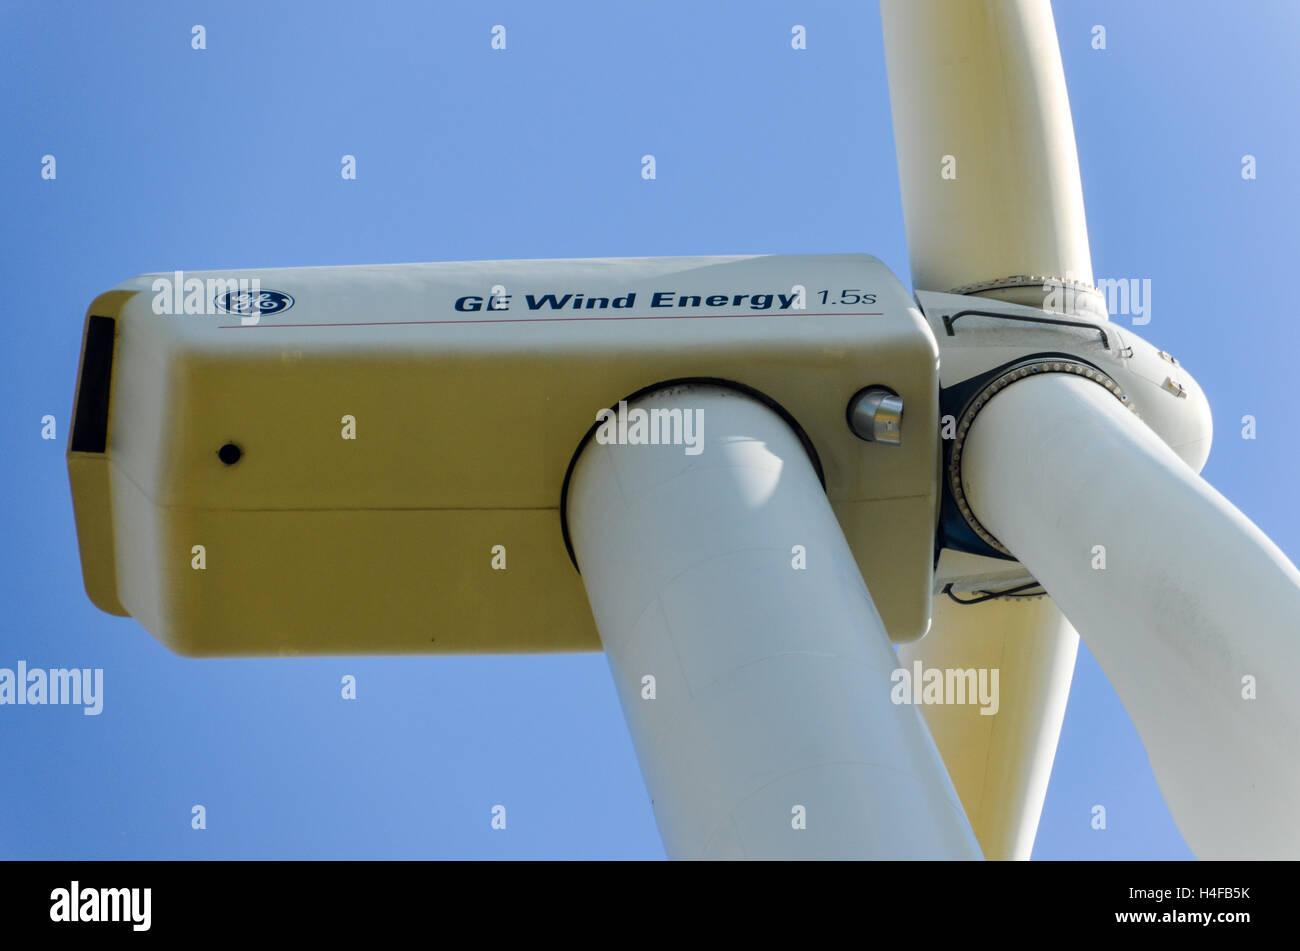 GE Wind Energy 1.5 MW turbine - Stock Image